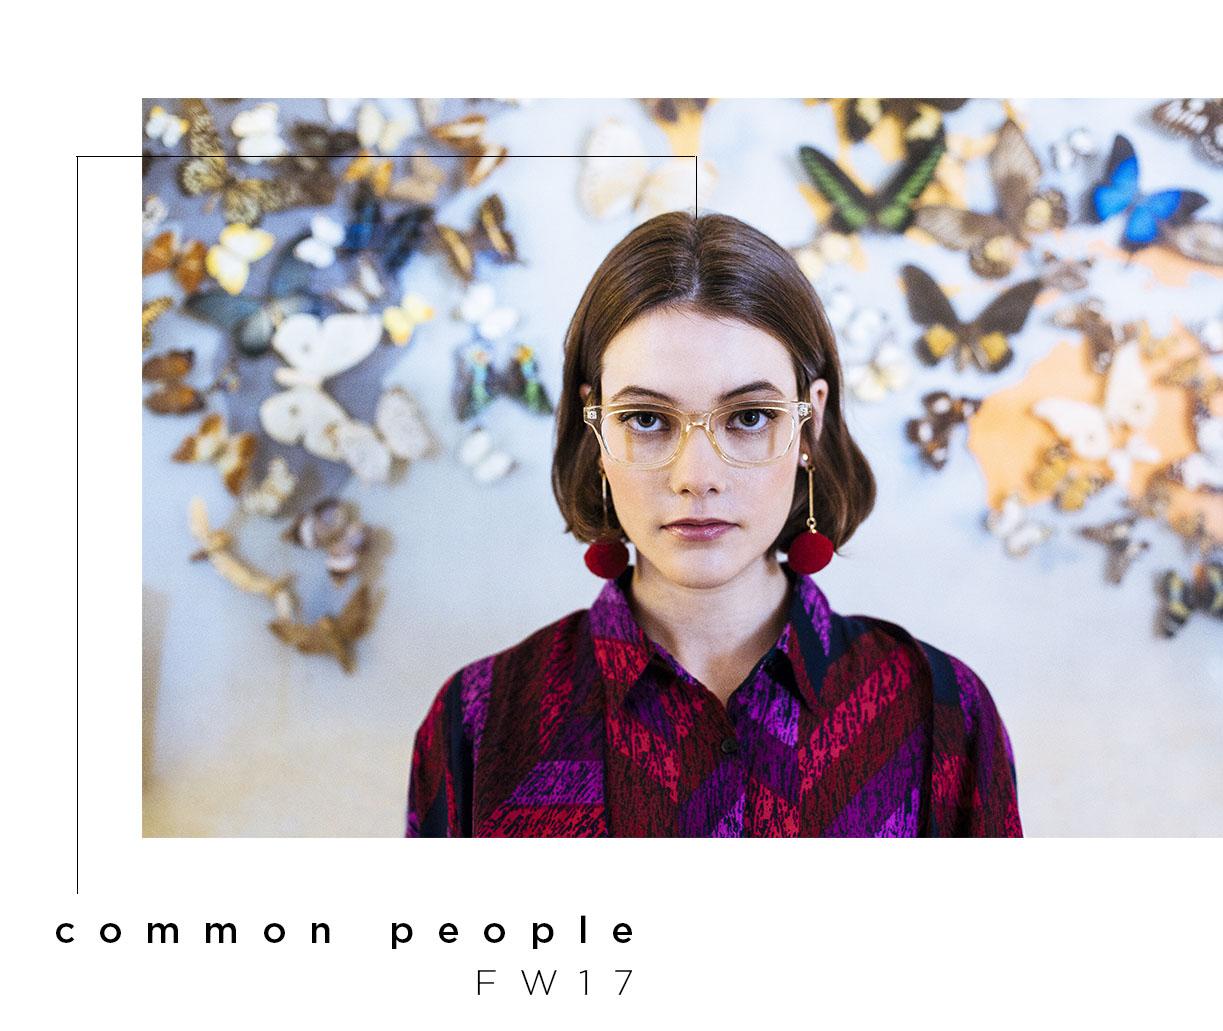 Common People - Compañia Fantástica